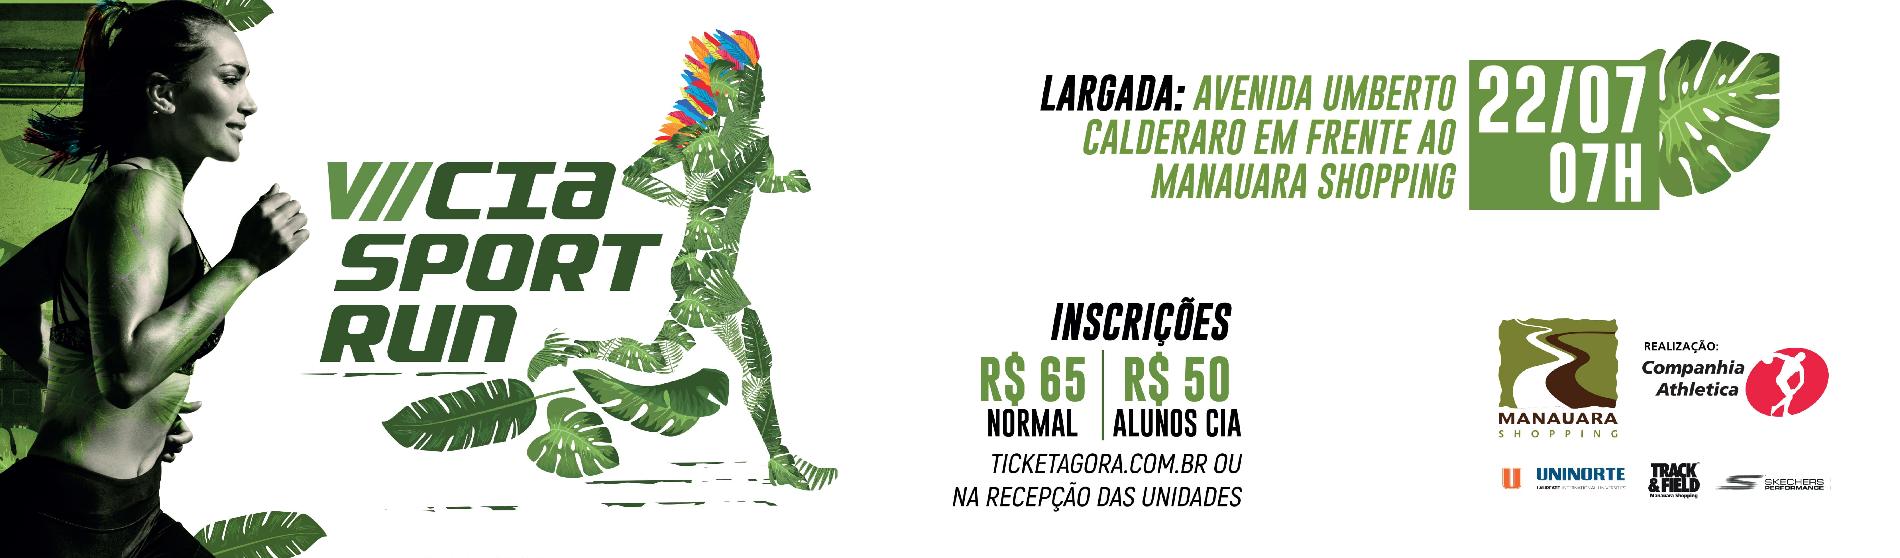 VII Cia Sports Run - Imagem de topo